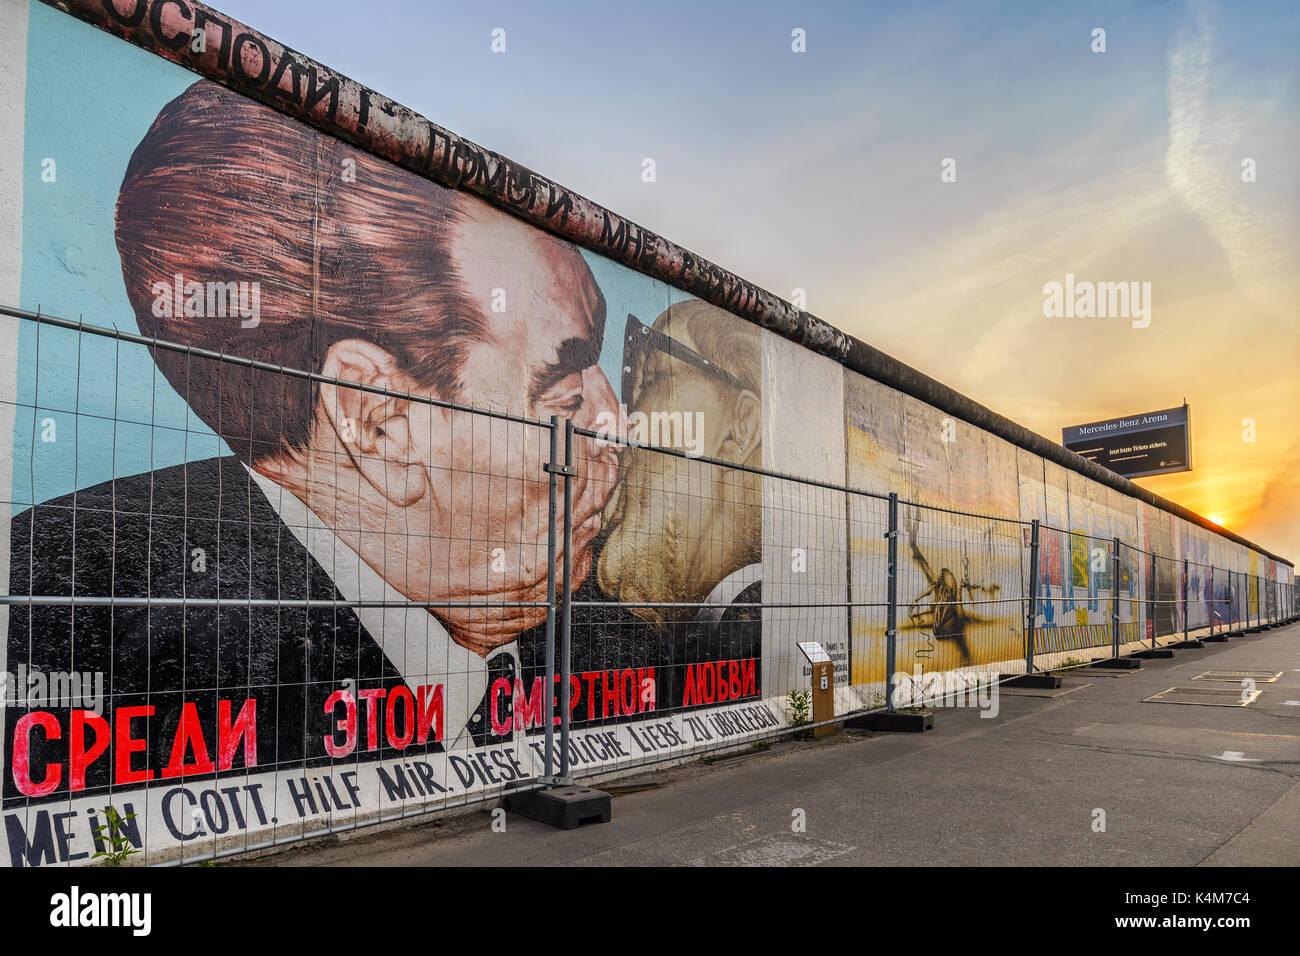 Berlín, Alemania: mayo 10, 2017: berlin skyline atardecer en el famoso muro de Berlín, Berlín, Alemania Imagen De Stock